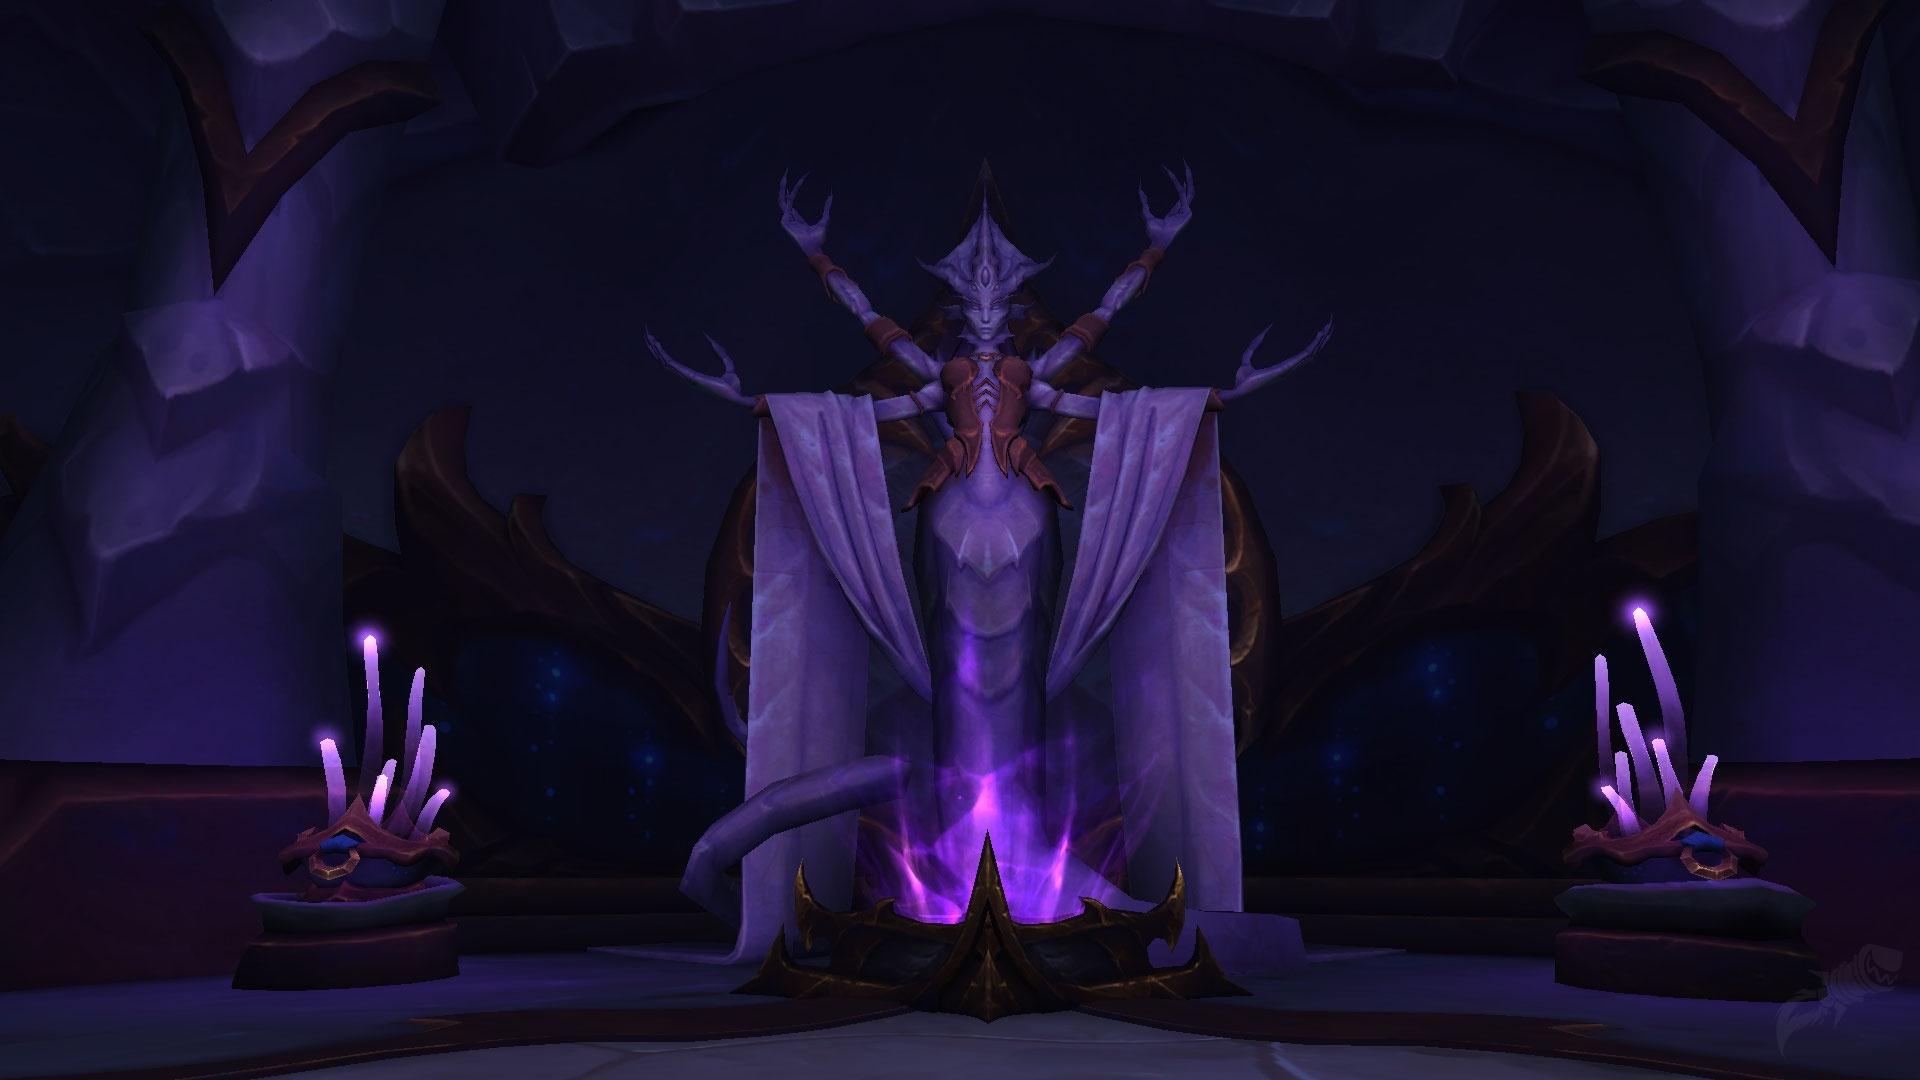 mondo di siti di incontri di Warcraft incontri Norwalk CT